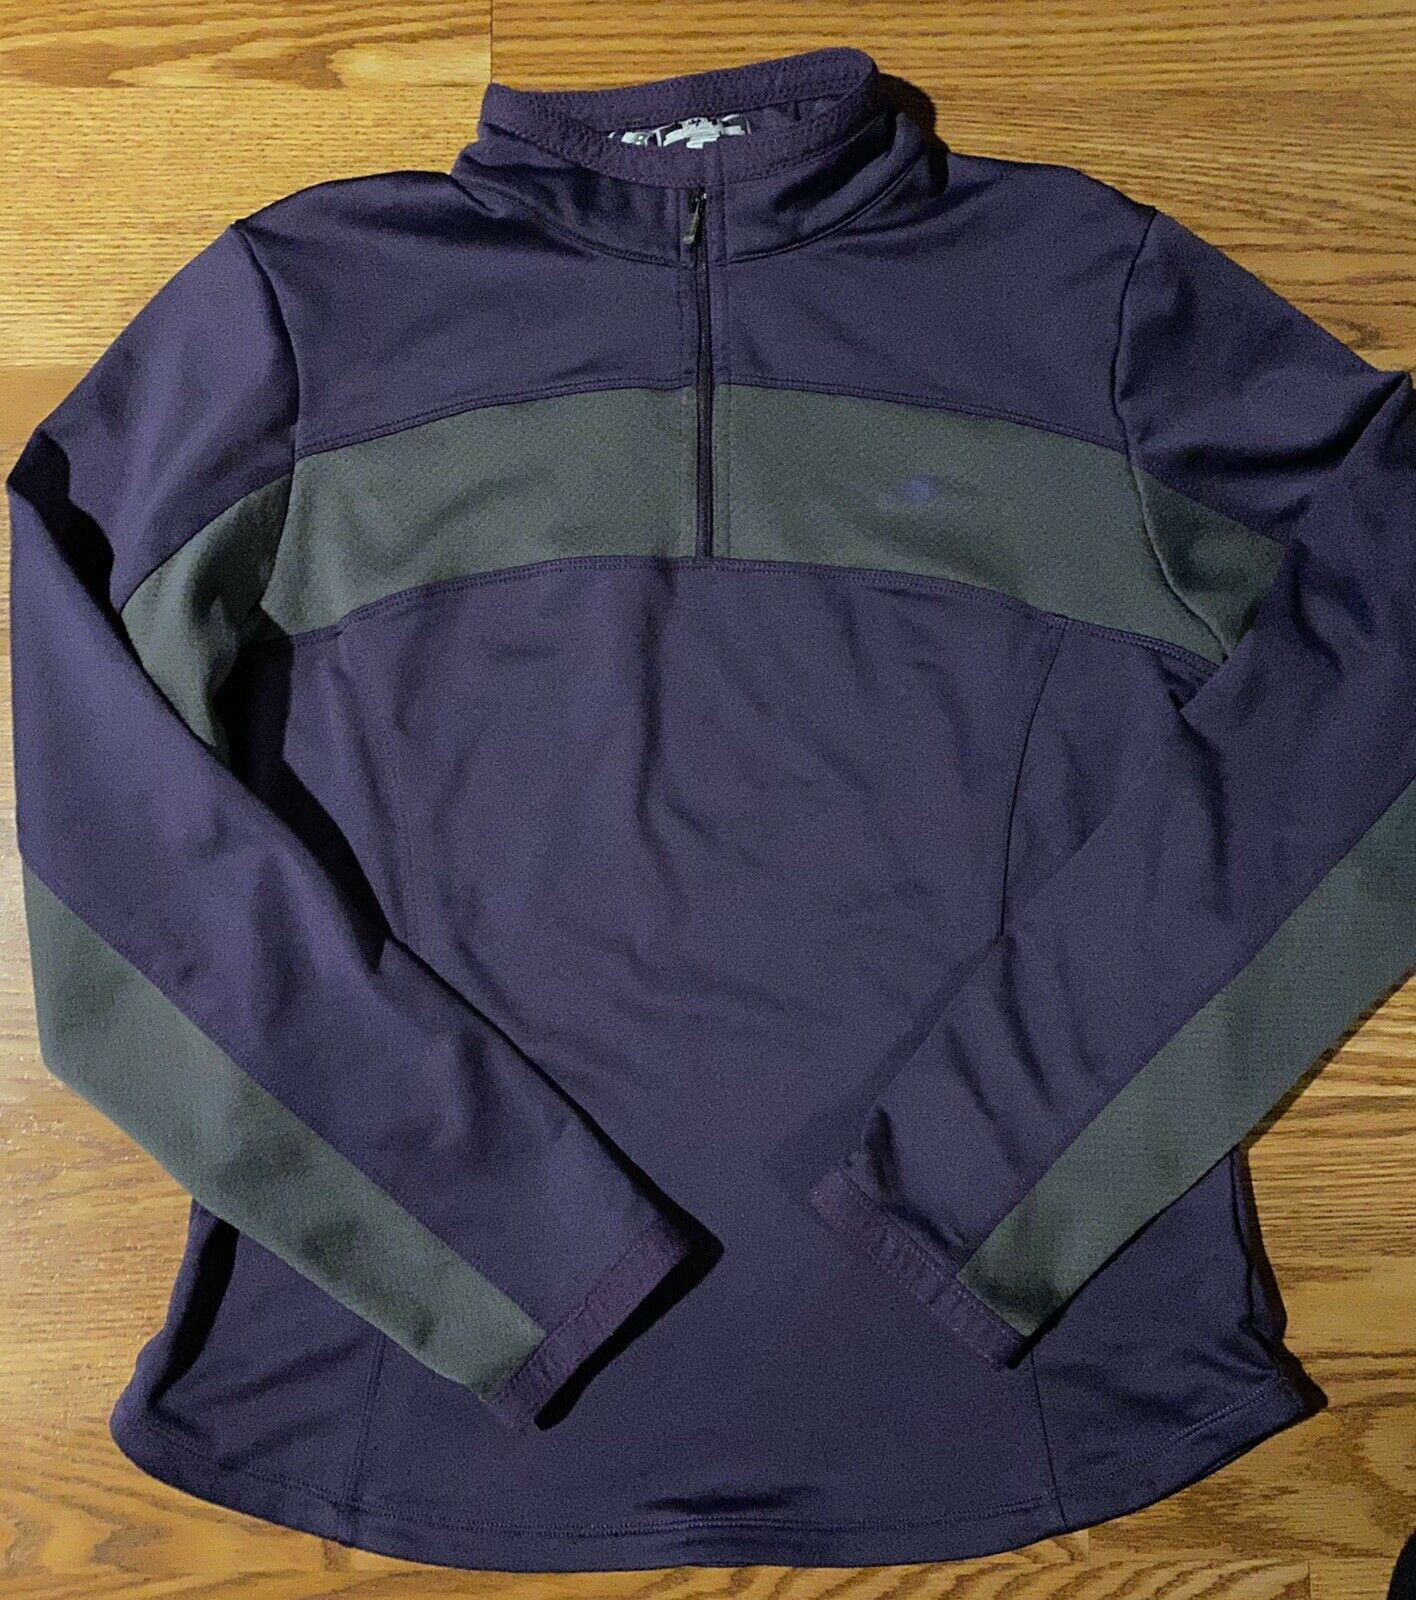 New Balance Collection Women's Purple Gray Long Sleeve 1/4 Zip Sweatshirt Size M